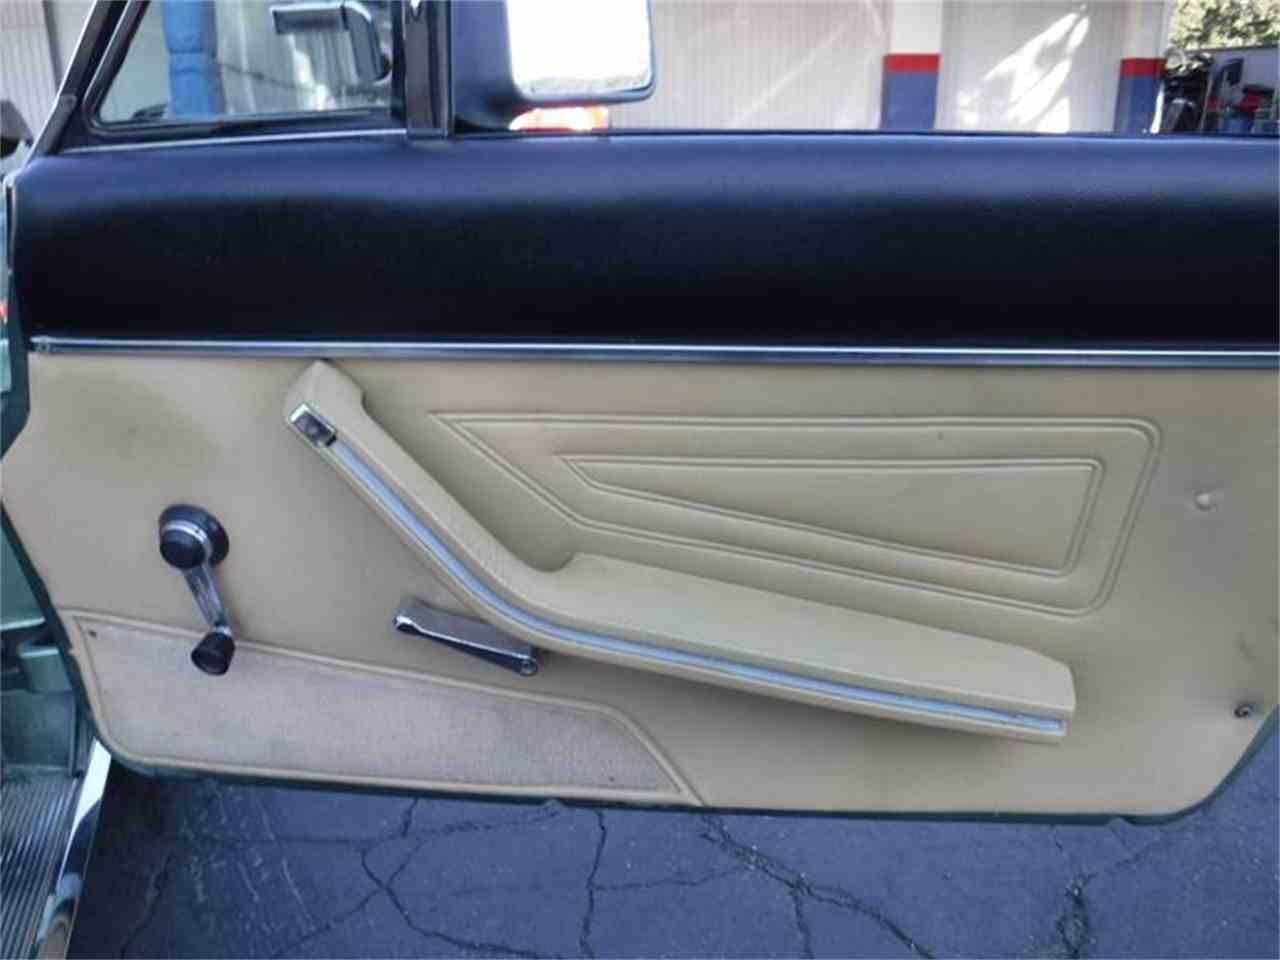 Large Picture of '80 Fiat 124 located in California - $10,995.00 - LGWQ